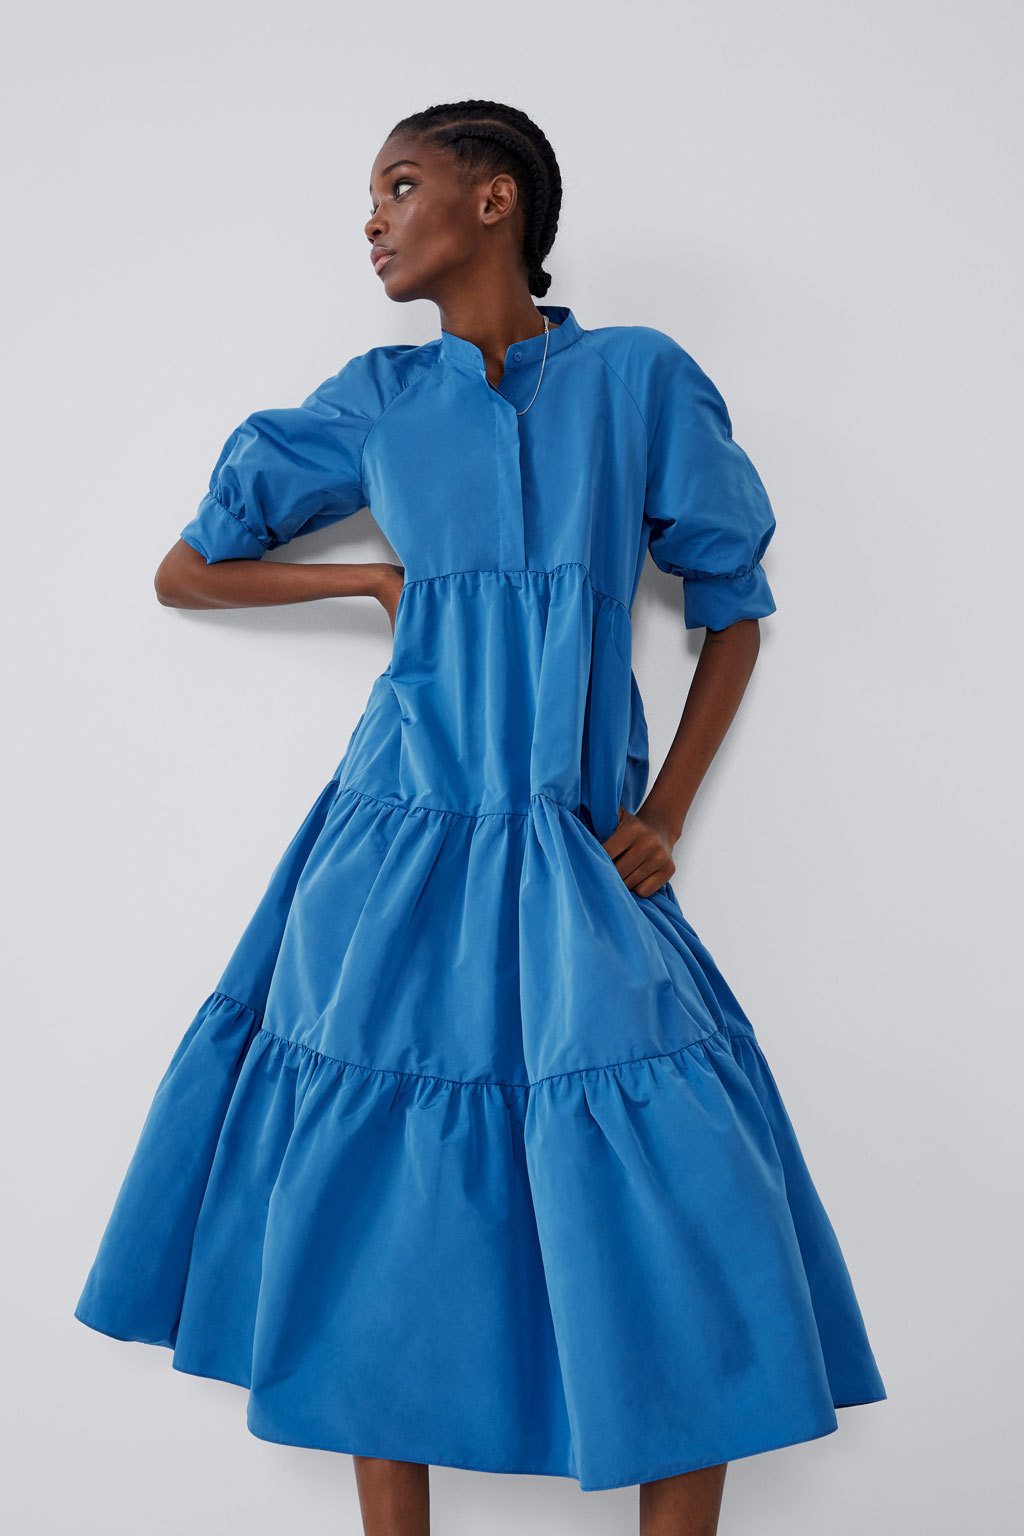 New Women's Autumn Puff Loose Dress ZAraing